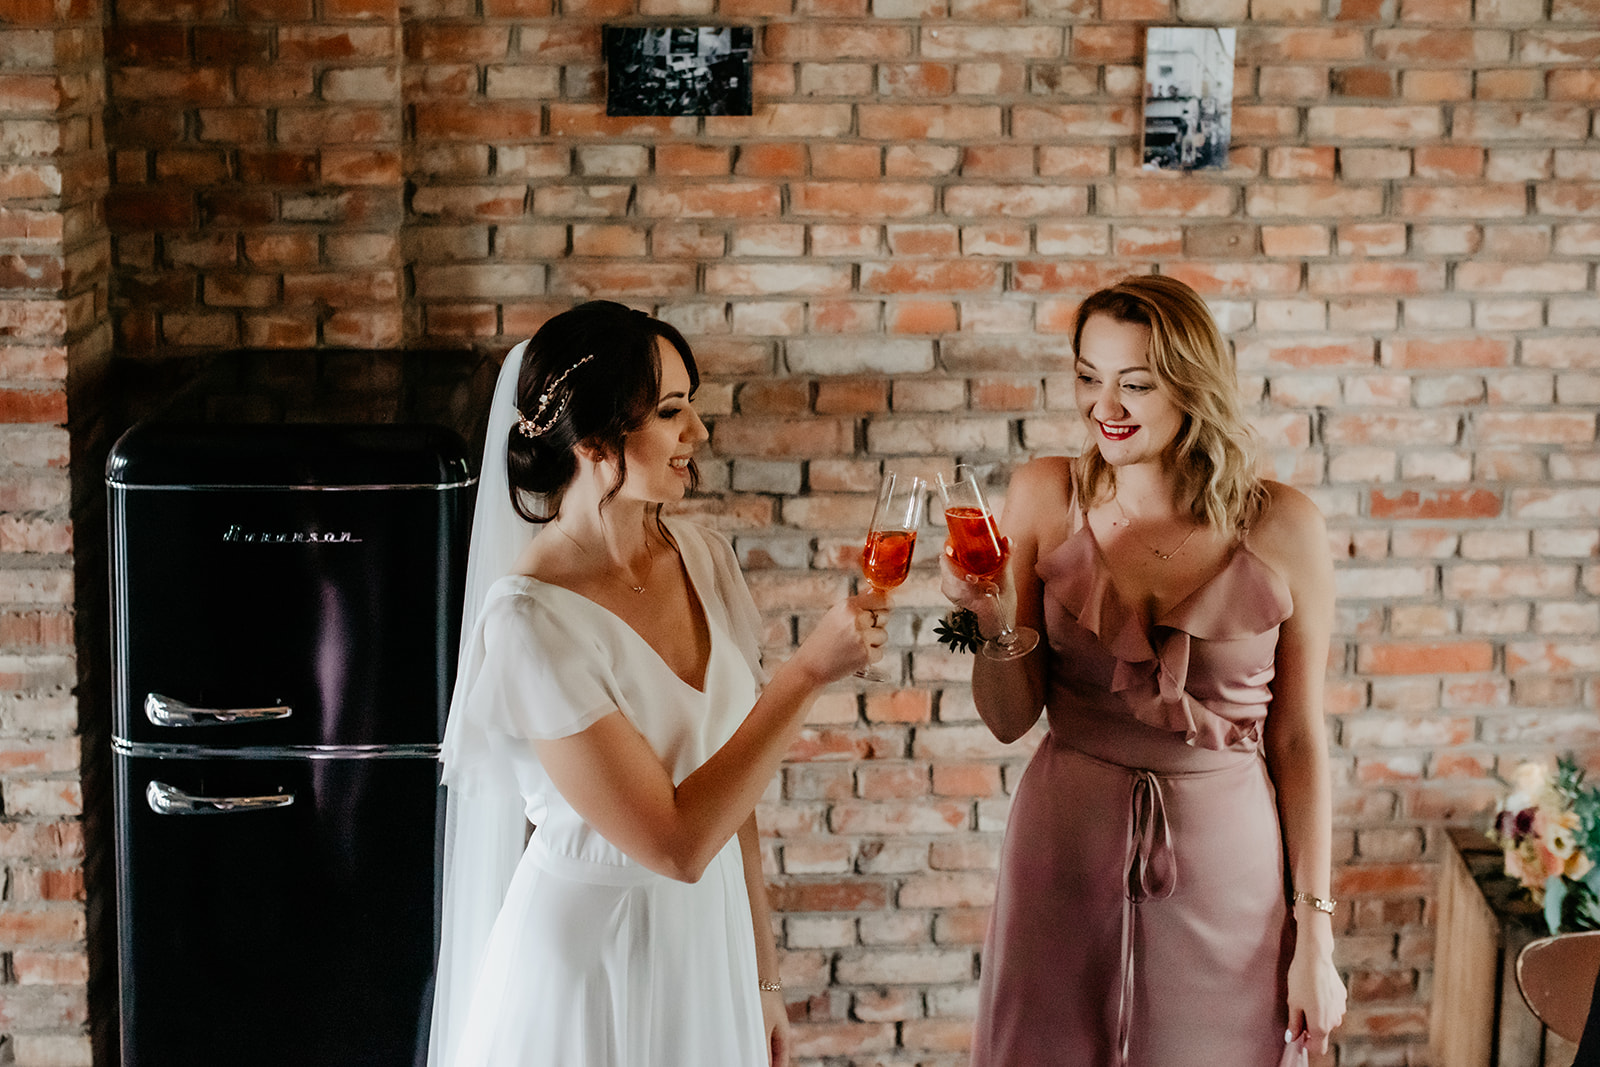 toast-dworek-ceglarnia-jaroslawki-paraobiektywni